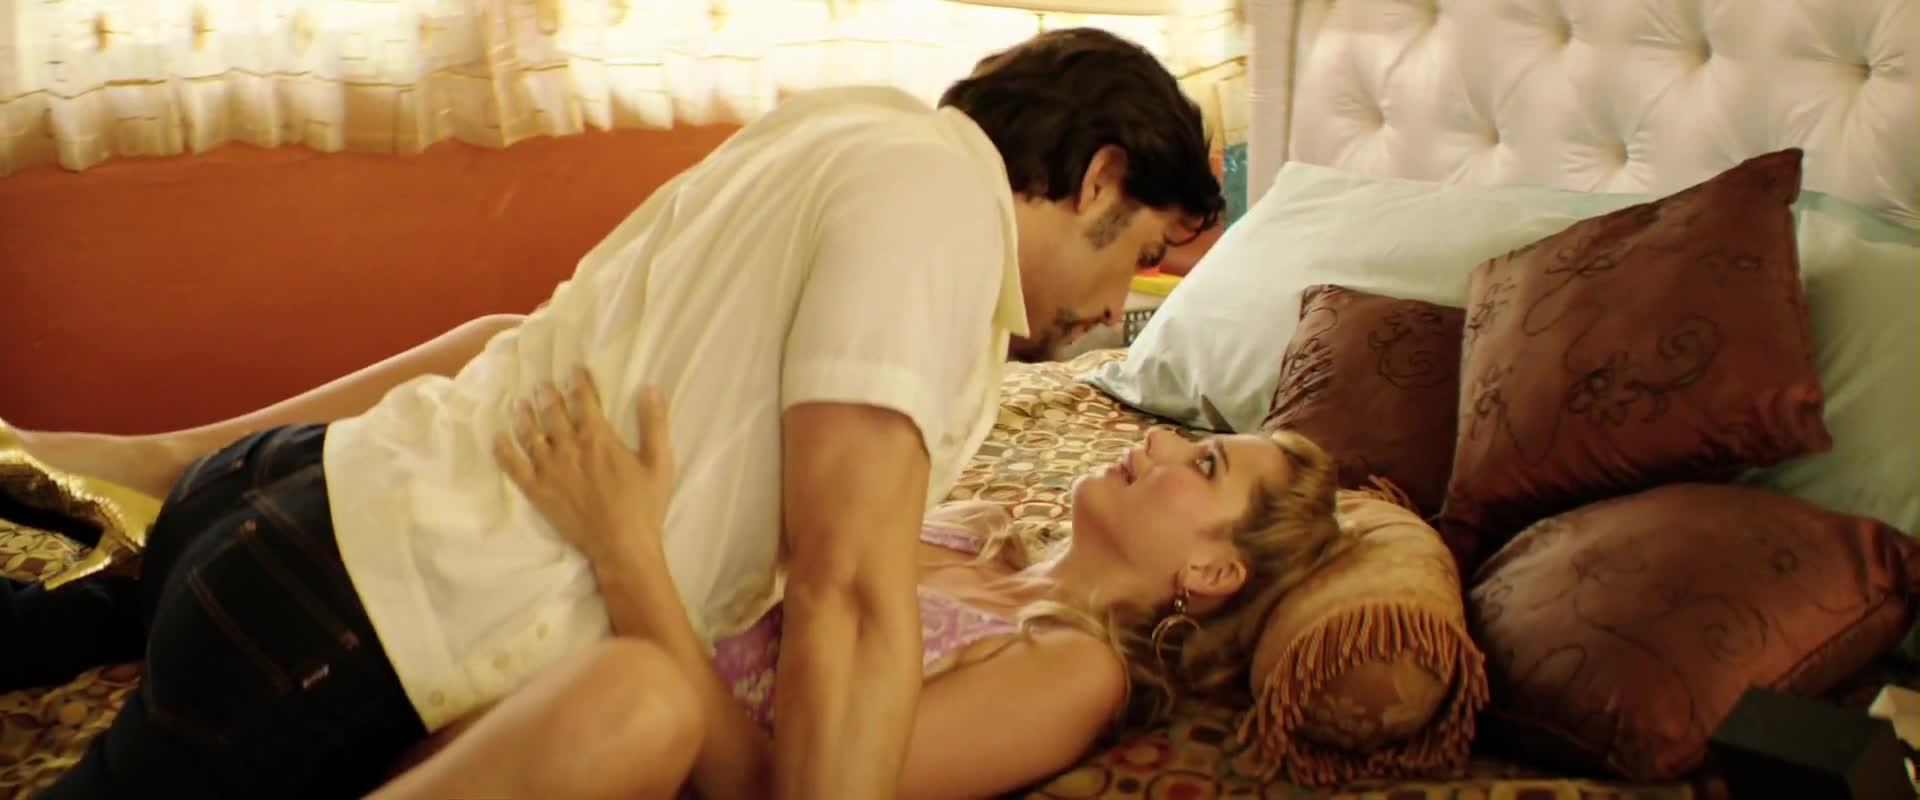 Ana Polvorosa Nude ana de armas - hands of stone (2016) sex scene